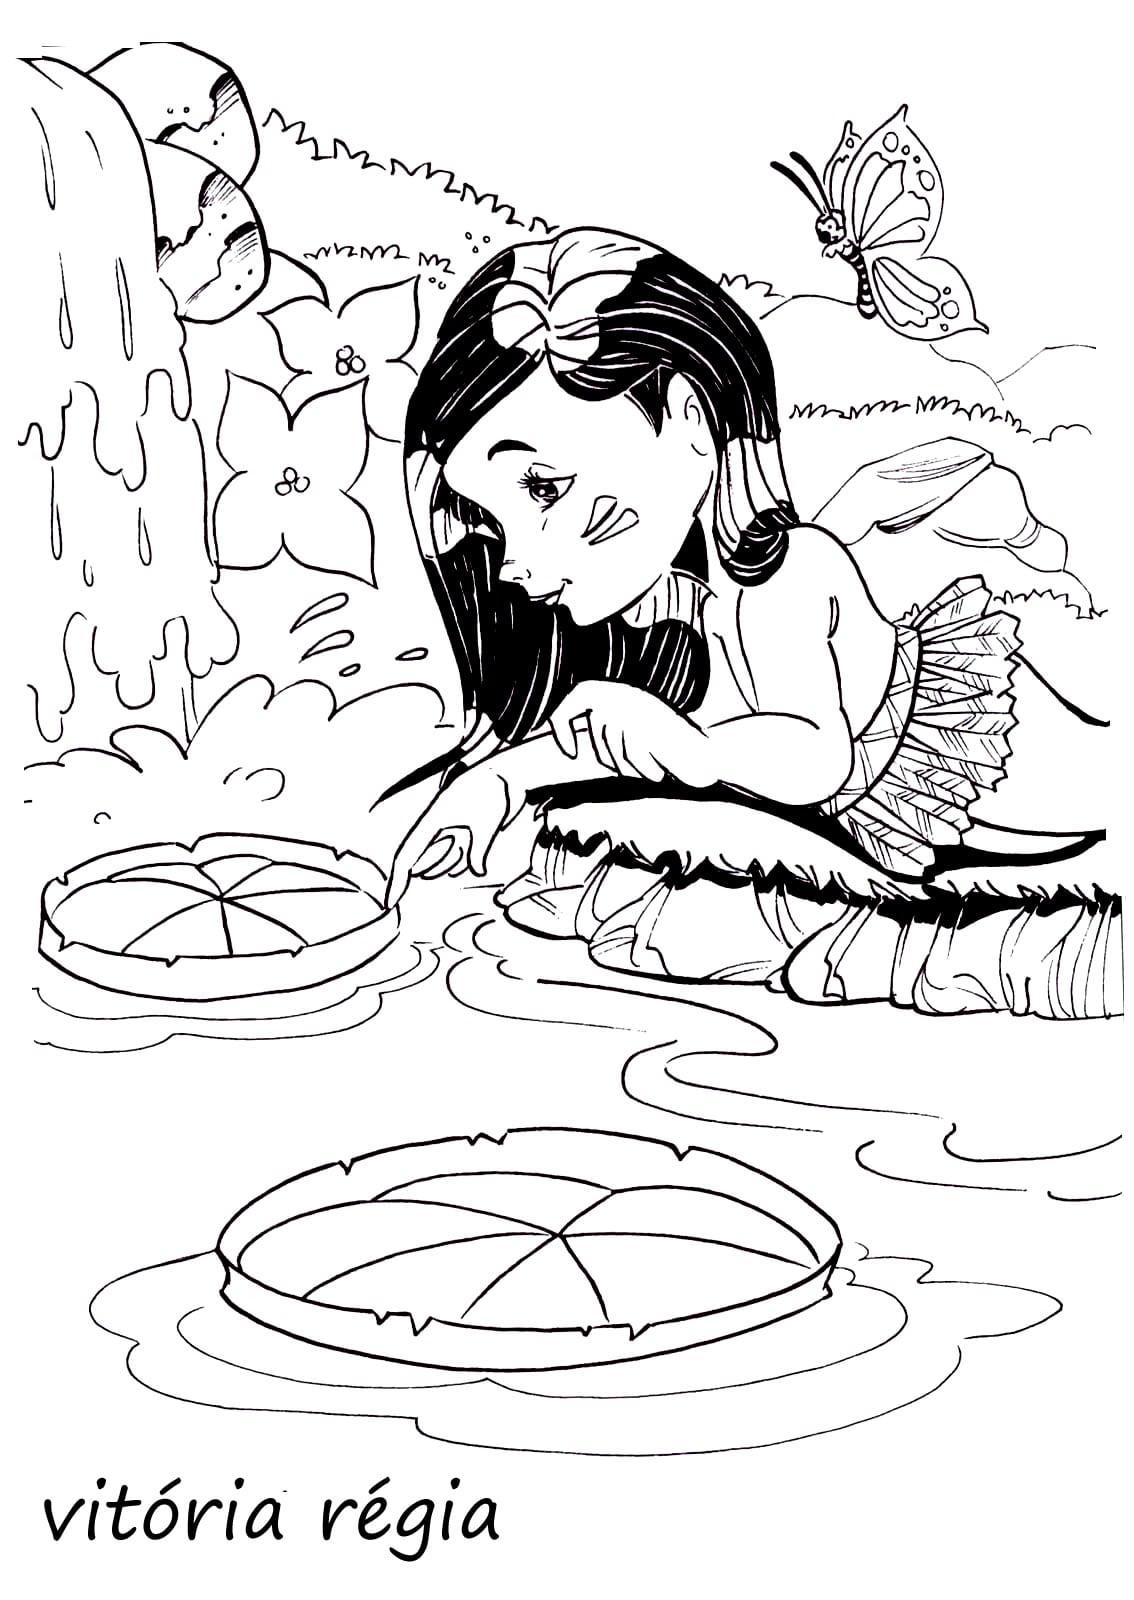 Desenhos Colorir Folclore  Saci Pererê, Cuca, Boi Bumbá, Mula Sem